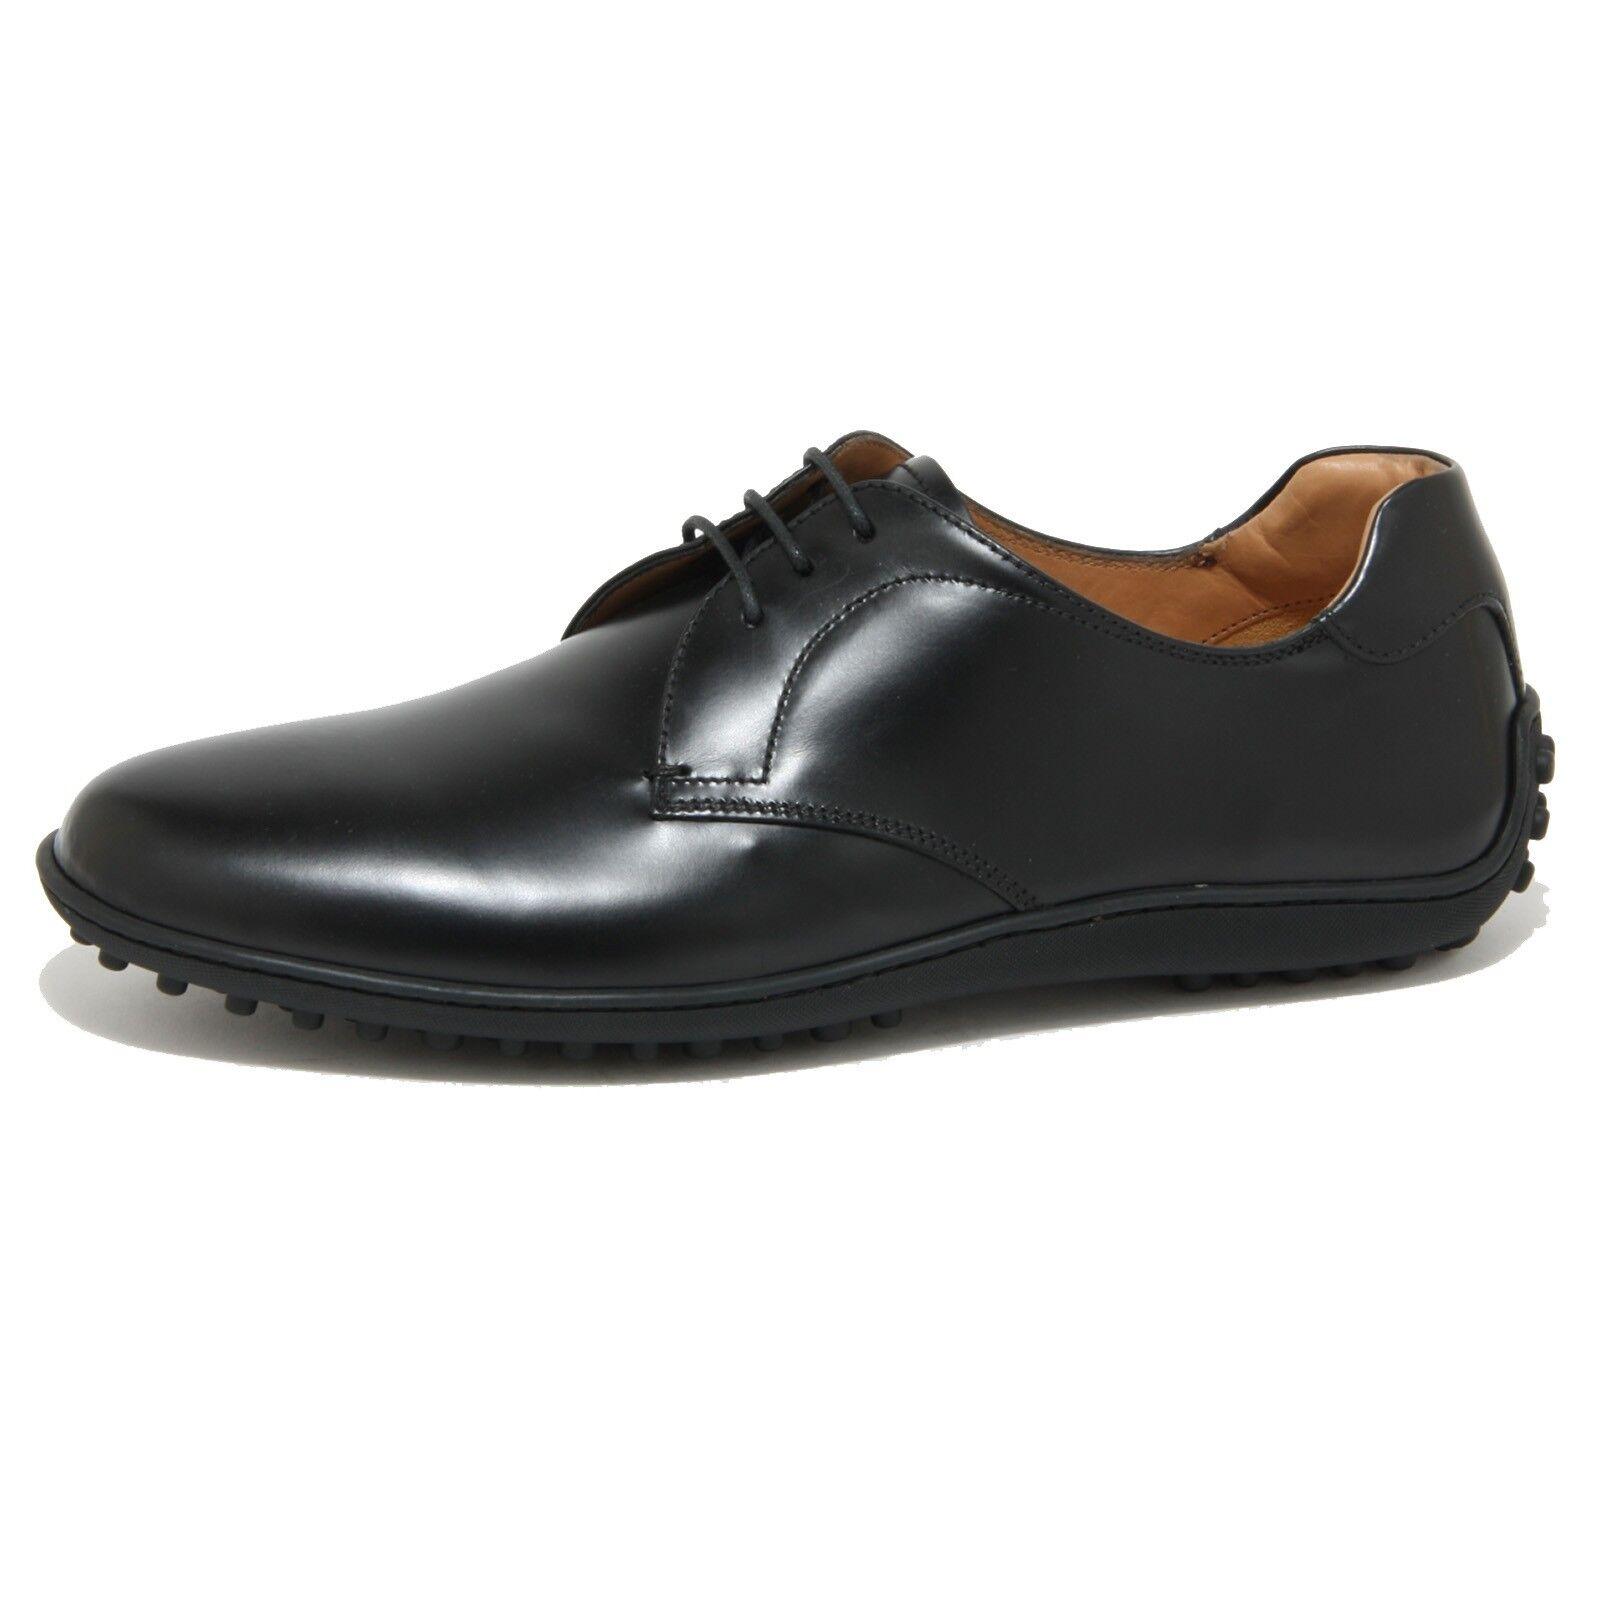 0927O scarpa allacciata CAR SHOE nero scarpe uomo Scarpe Uomo